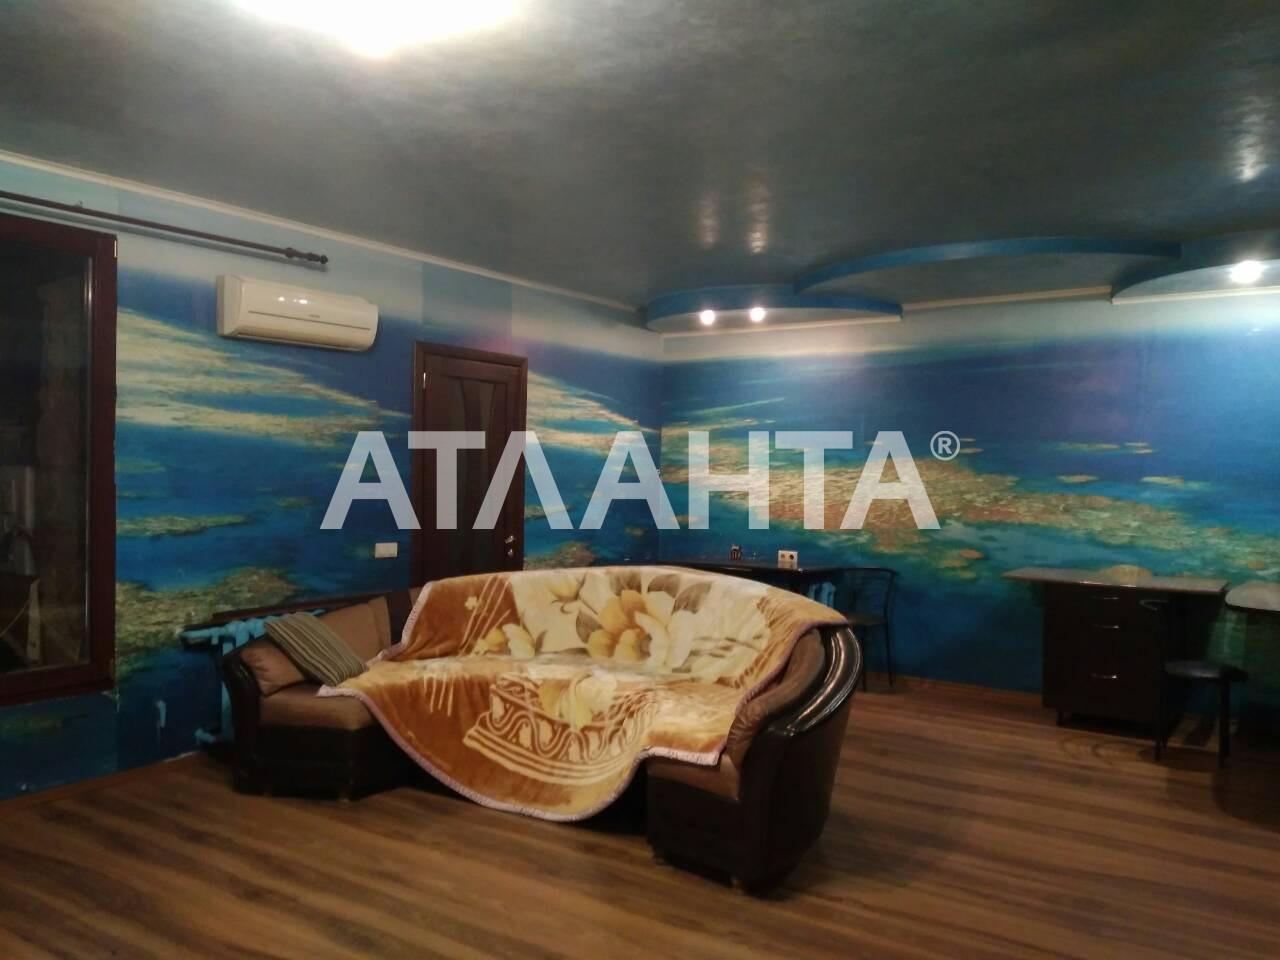 Продается 2-комнатная Квартира на ул. Тополевая — 69 000 у.е. (фото №3)